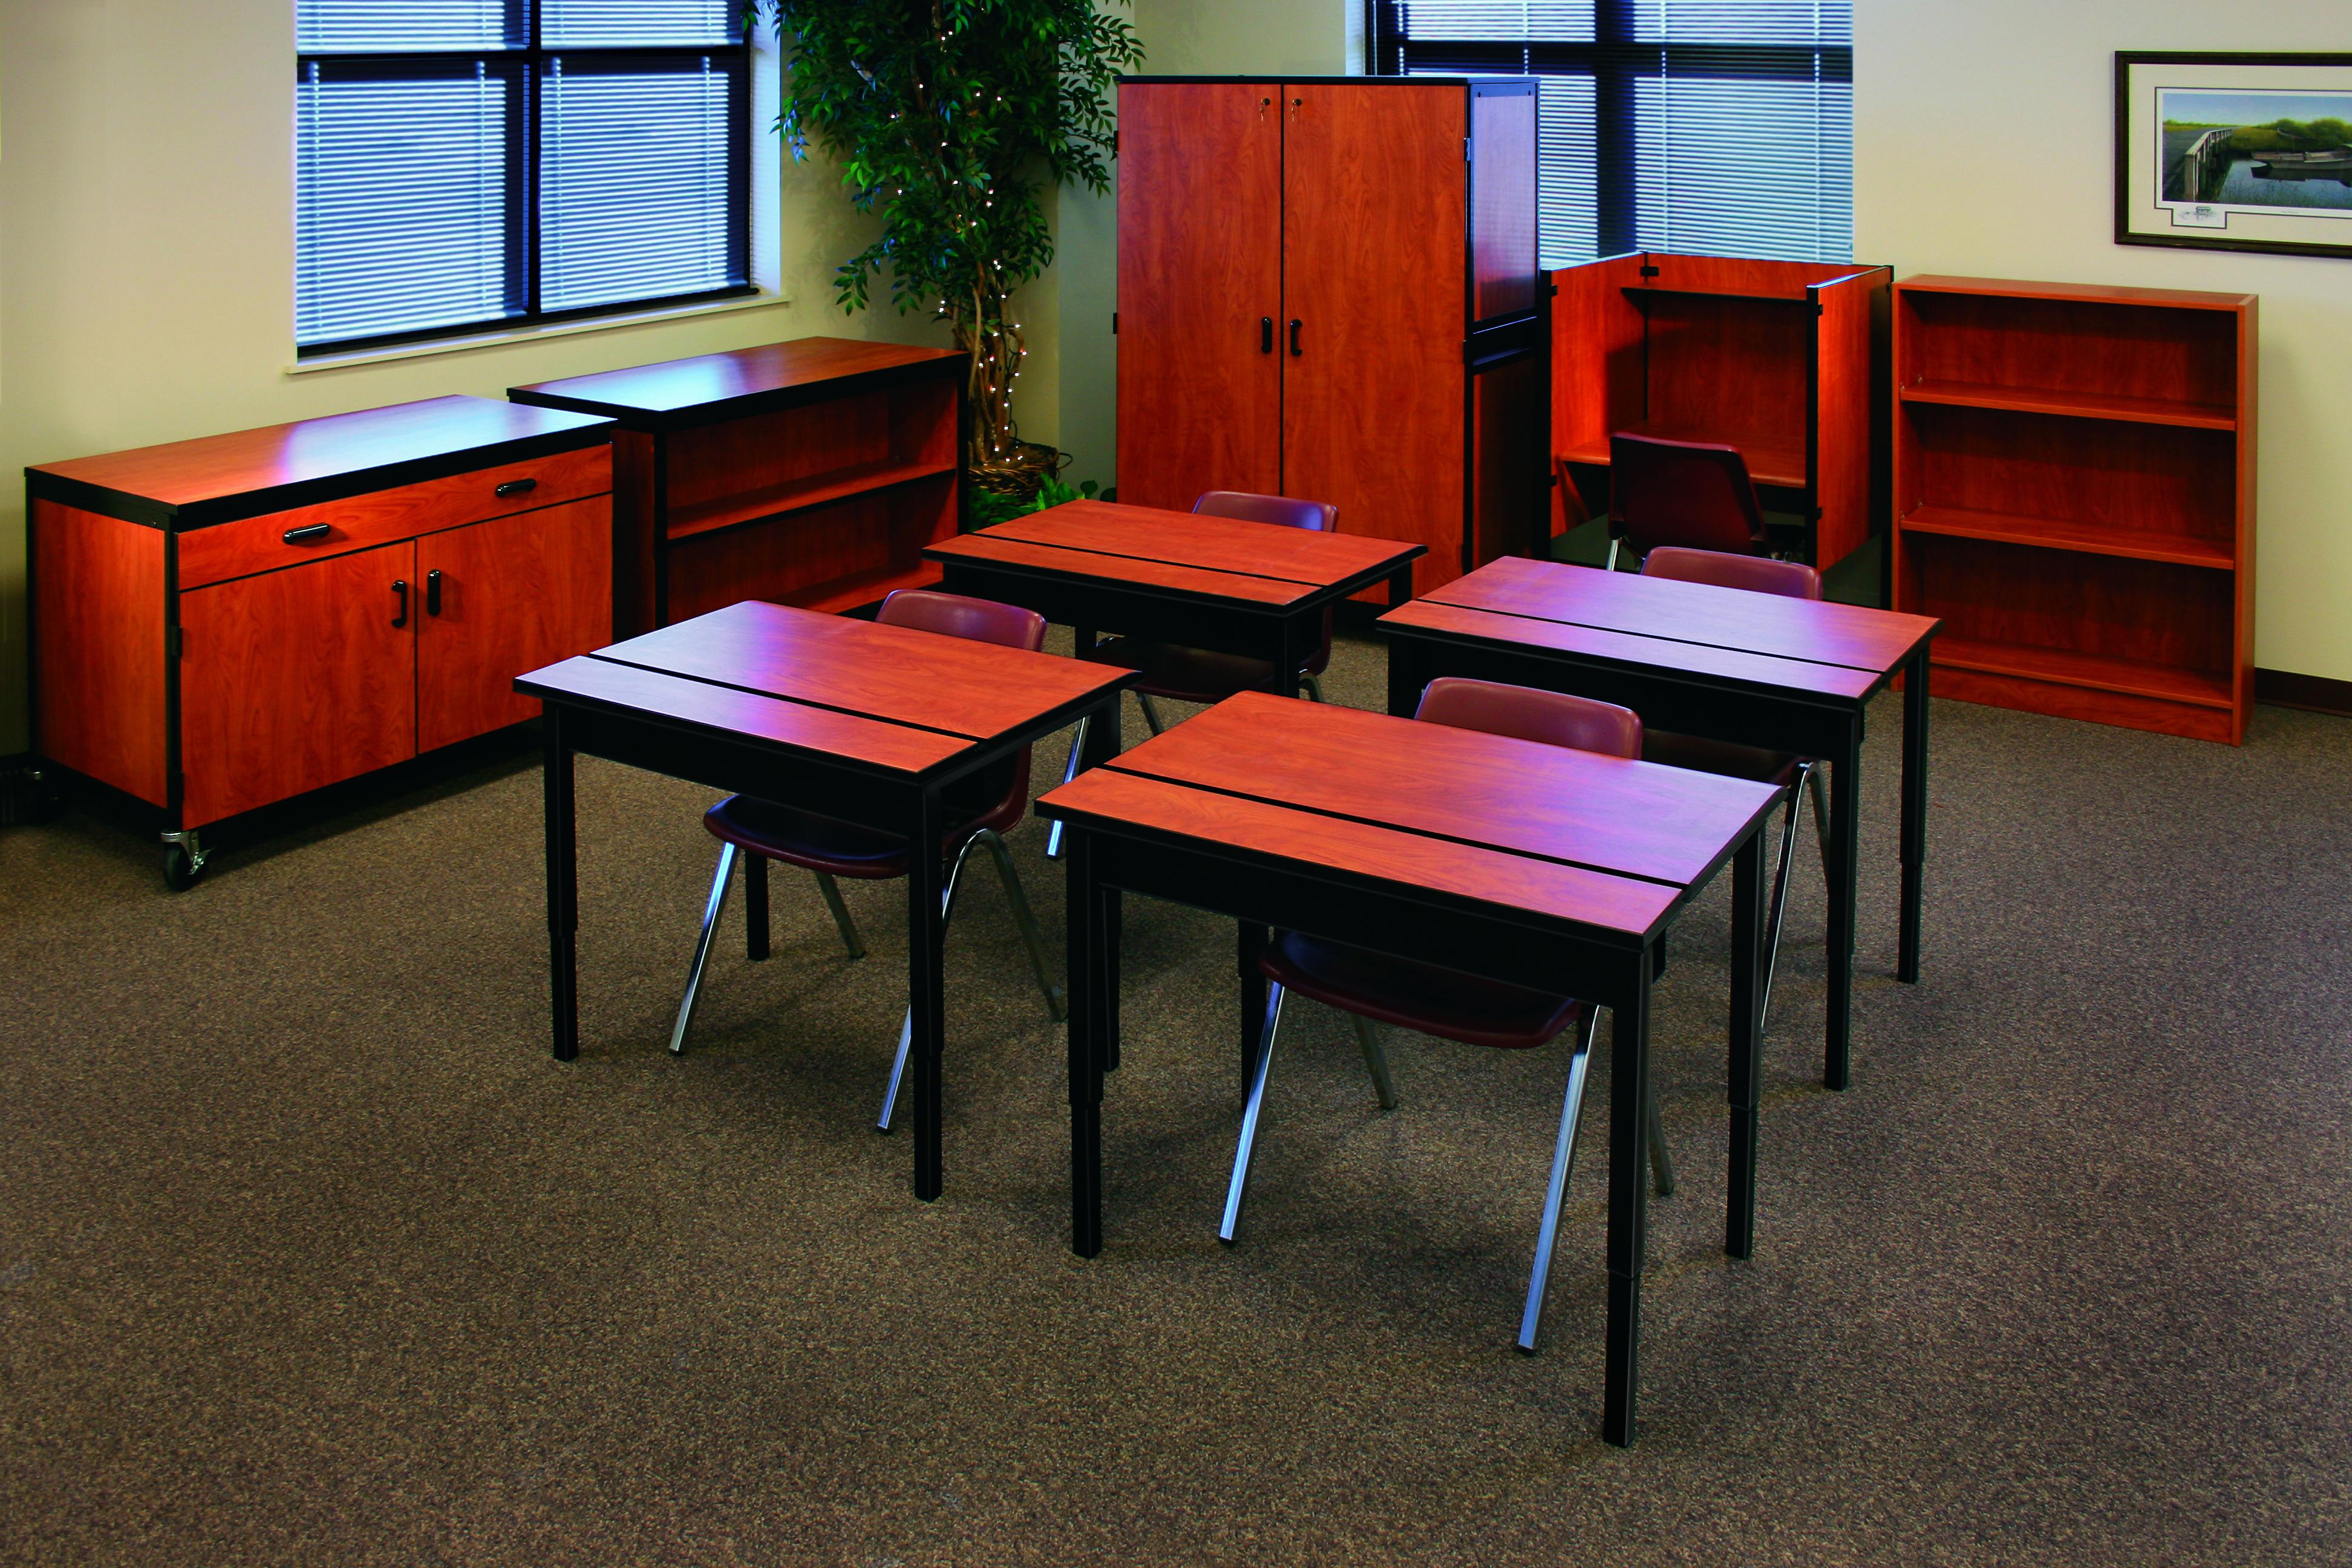 Corilam Educational Classroom Setting